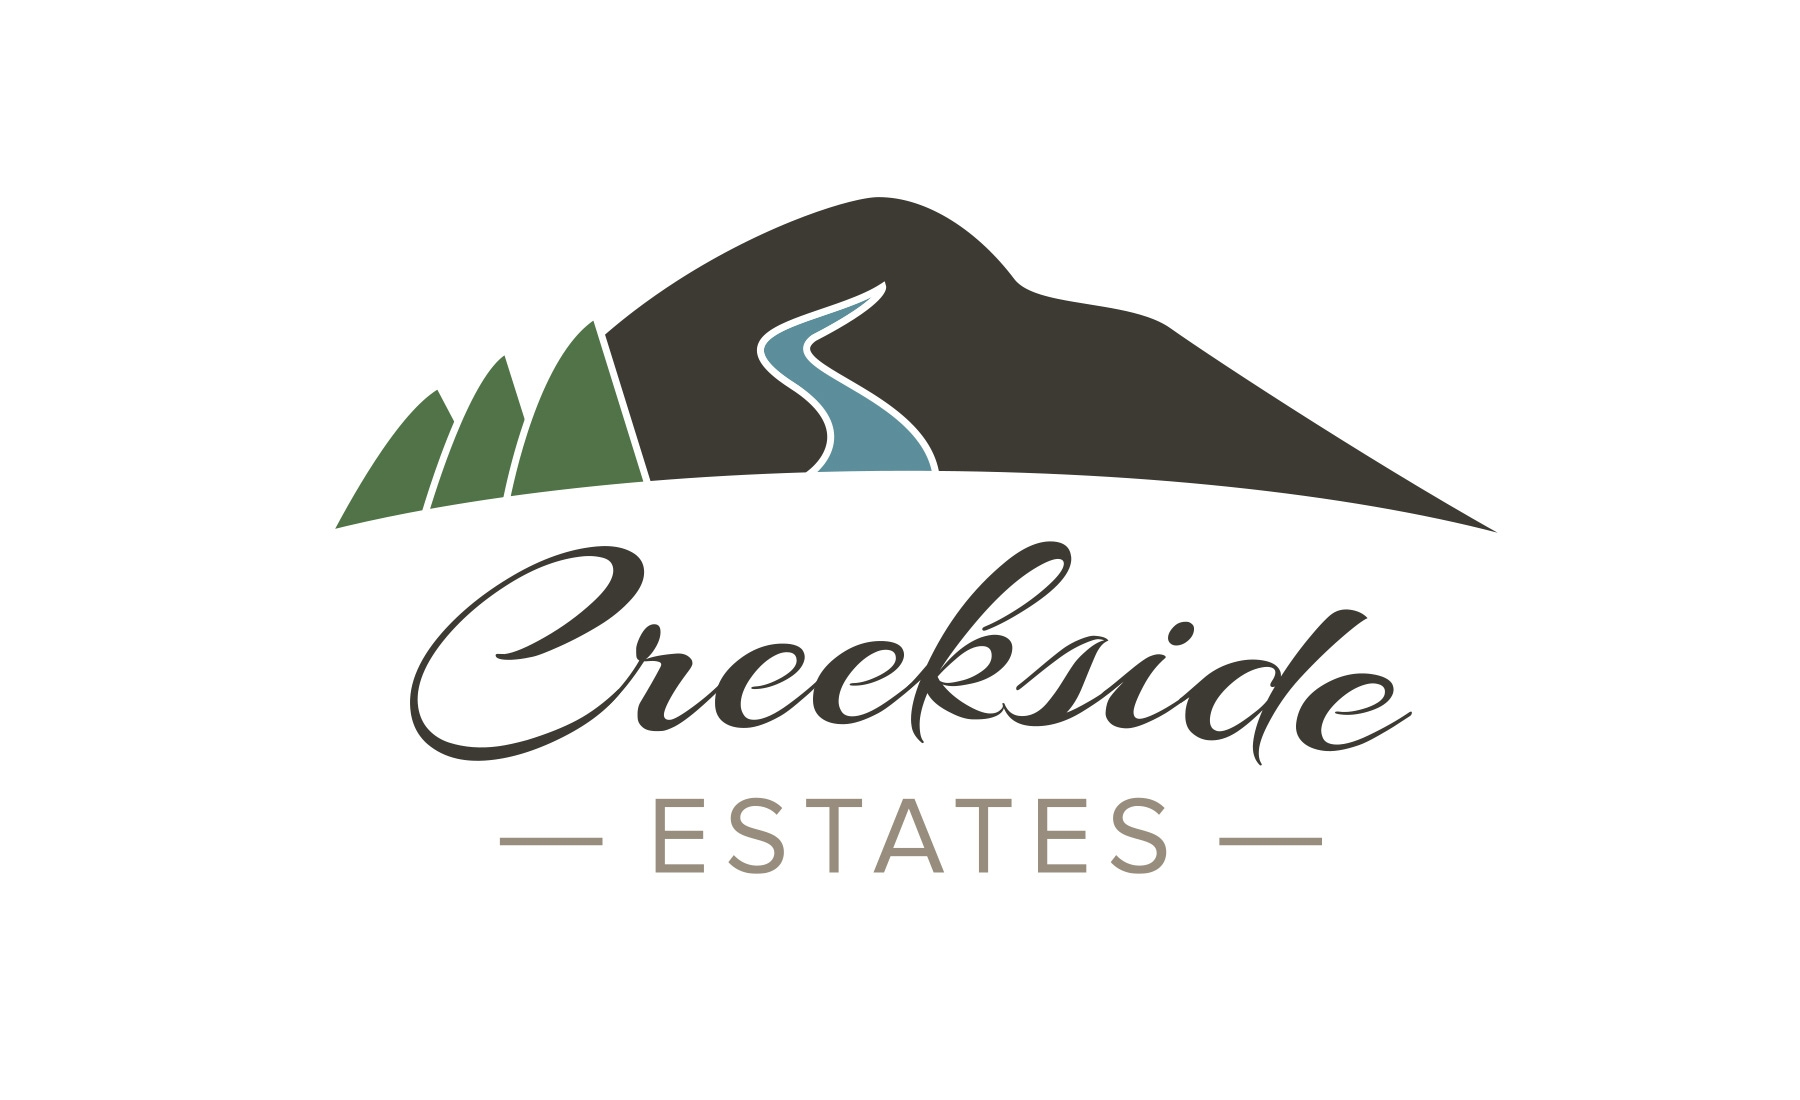 Creekside Estates Case Study By Digital Designs